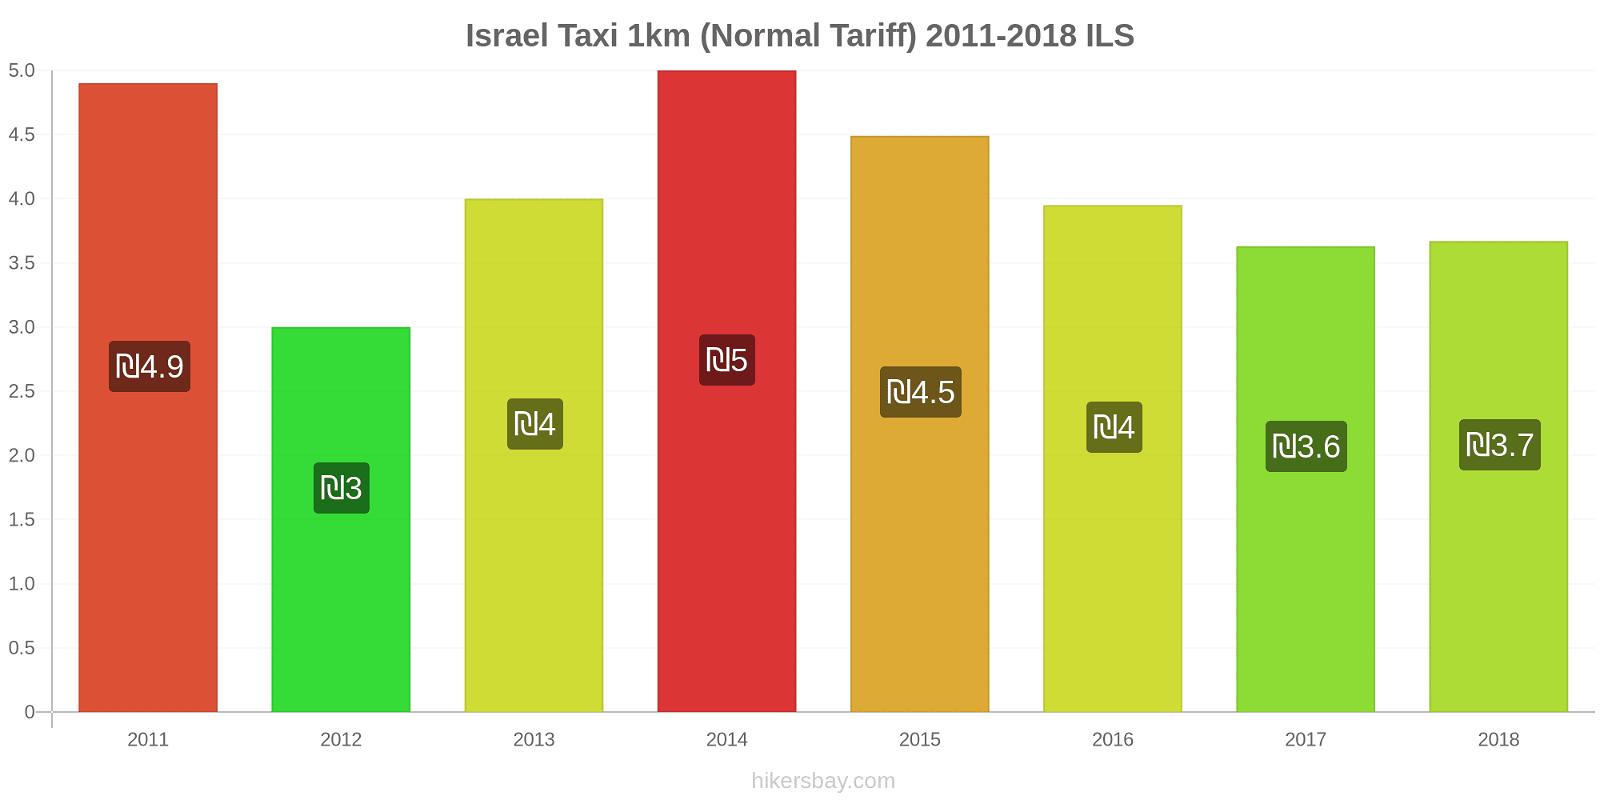 Israel price changes Taxi 1km (Normal Tariff) hikersbay.com